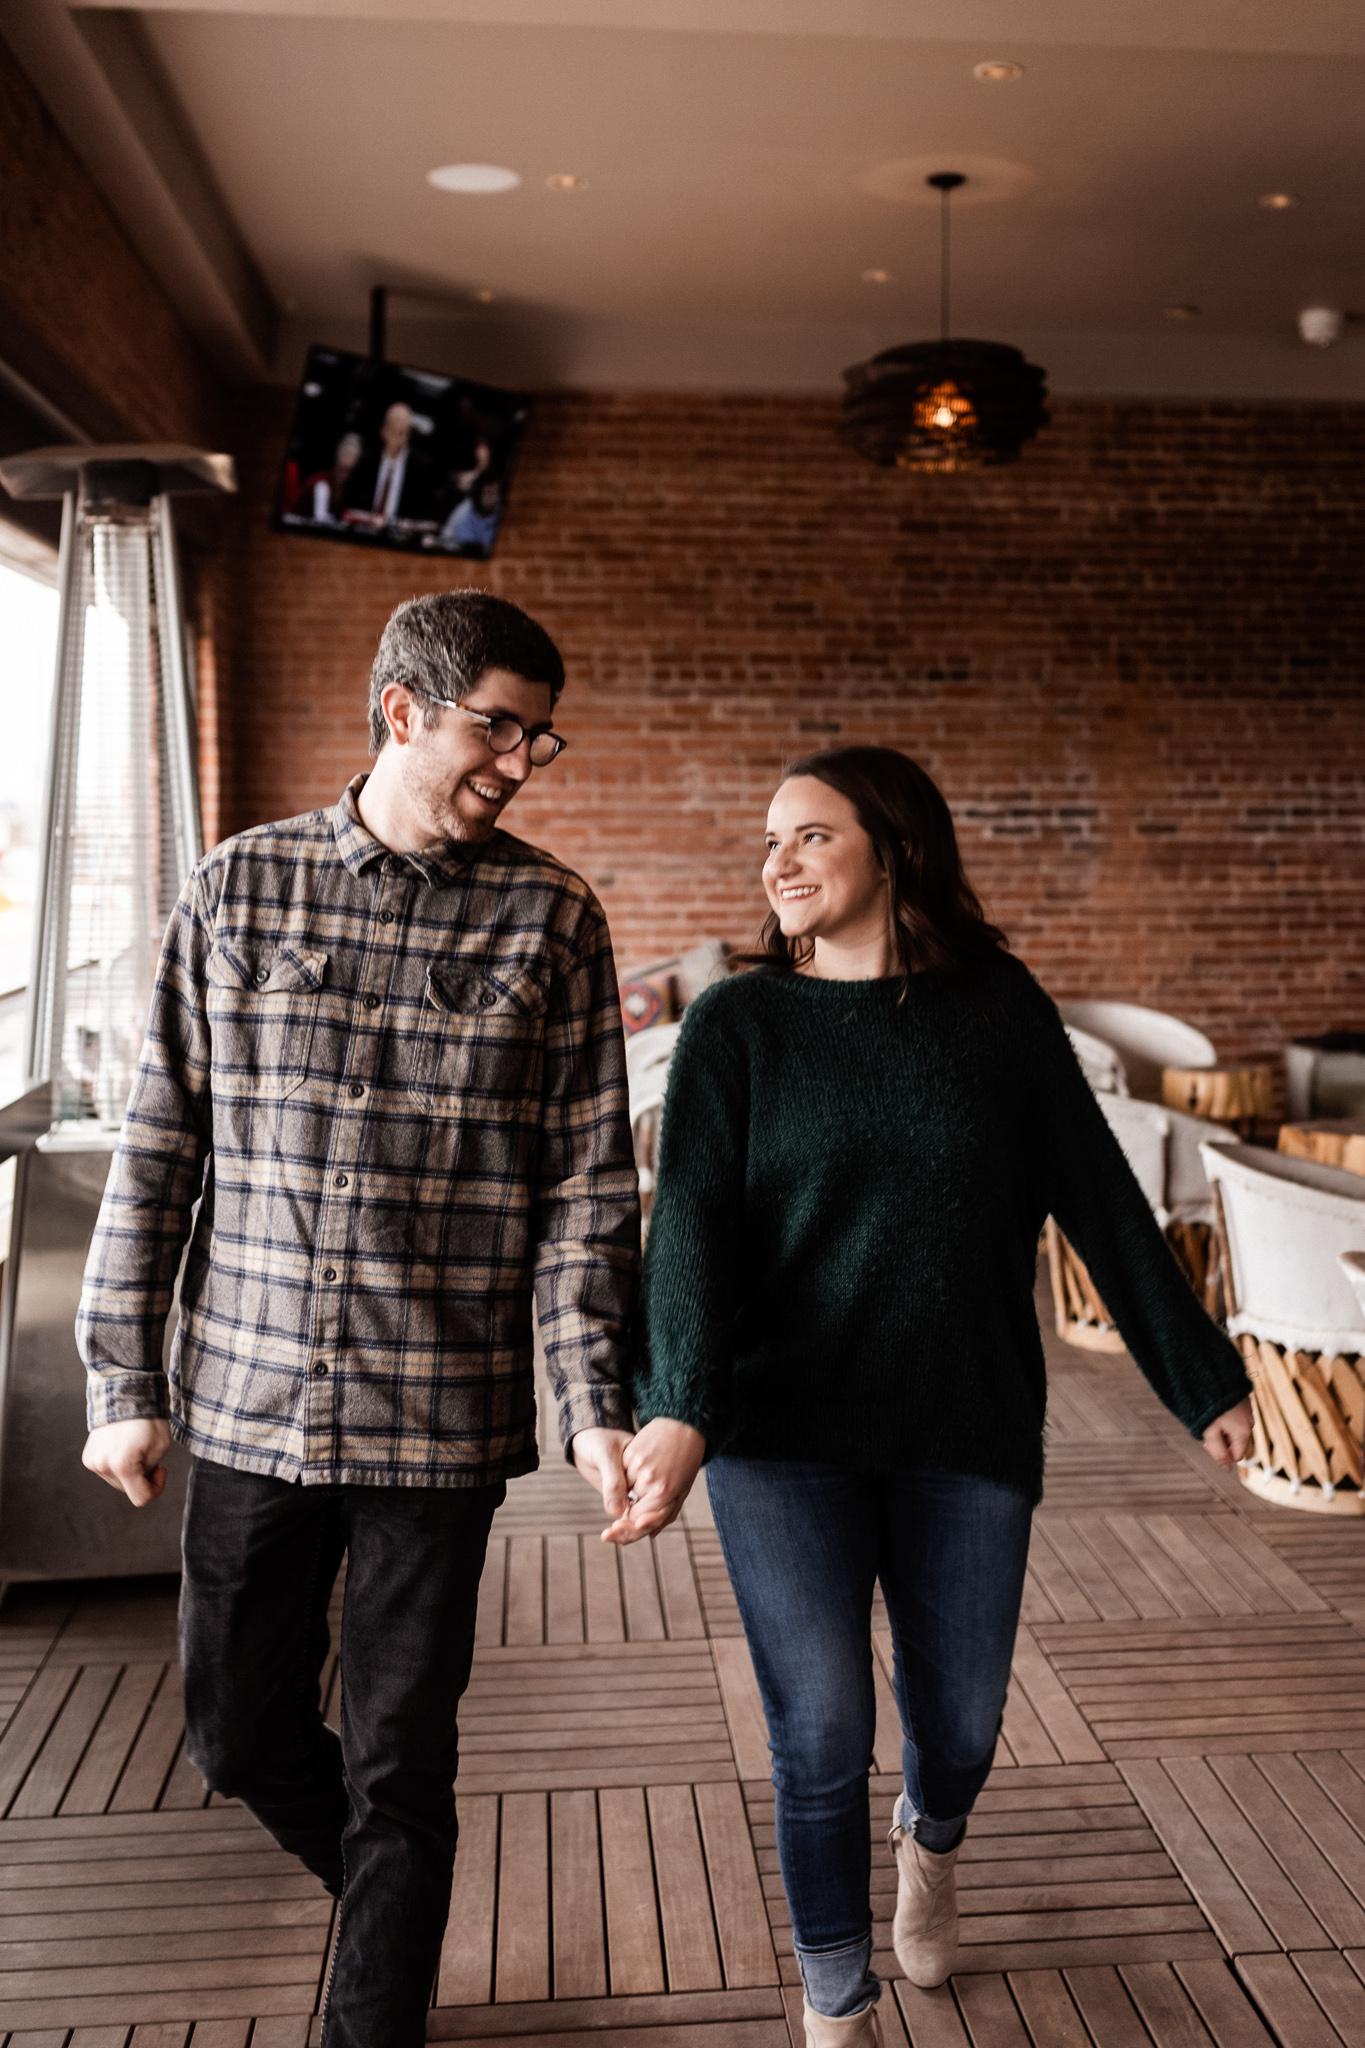 Seamus + Lauren | Modern Downtown Engagements | Oklahoma Wedding Photographer-13.jpg